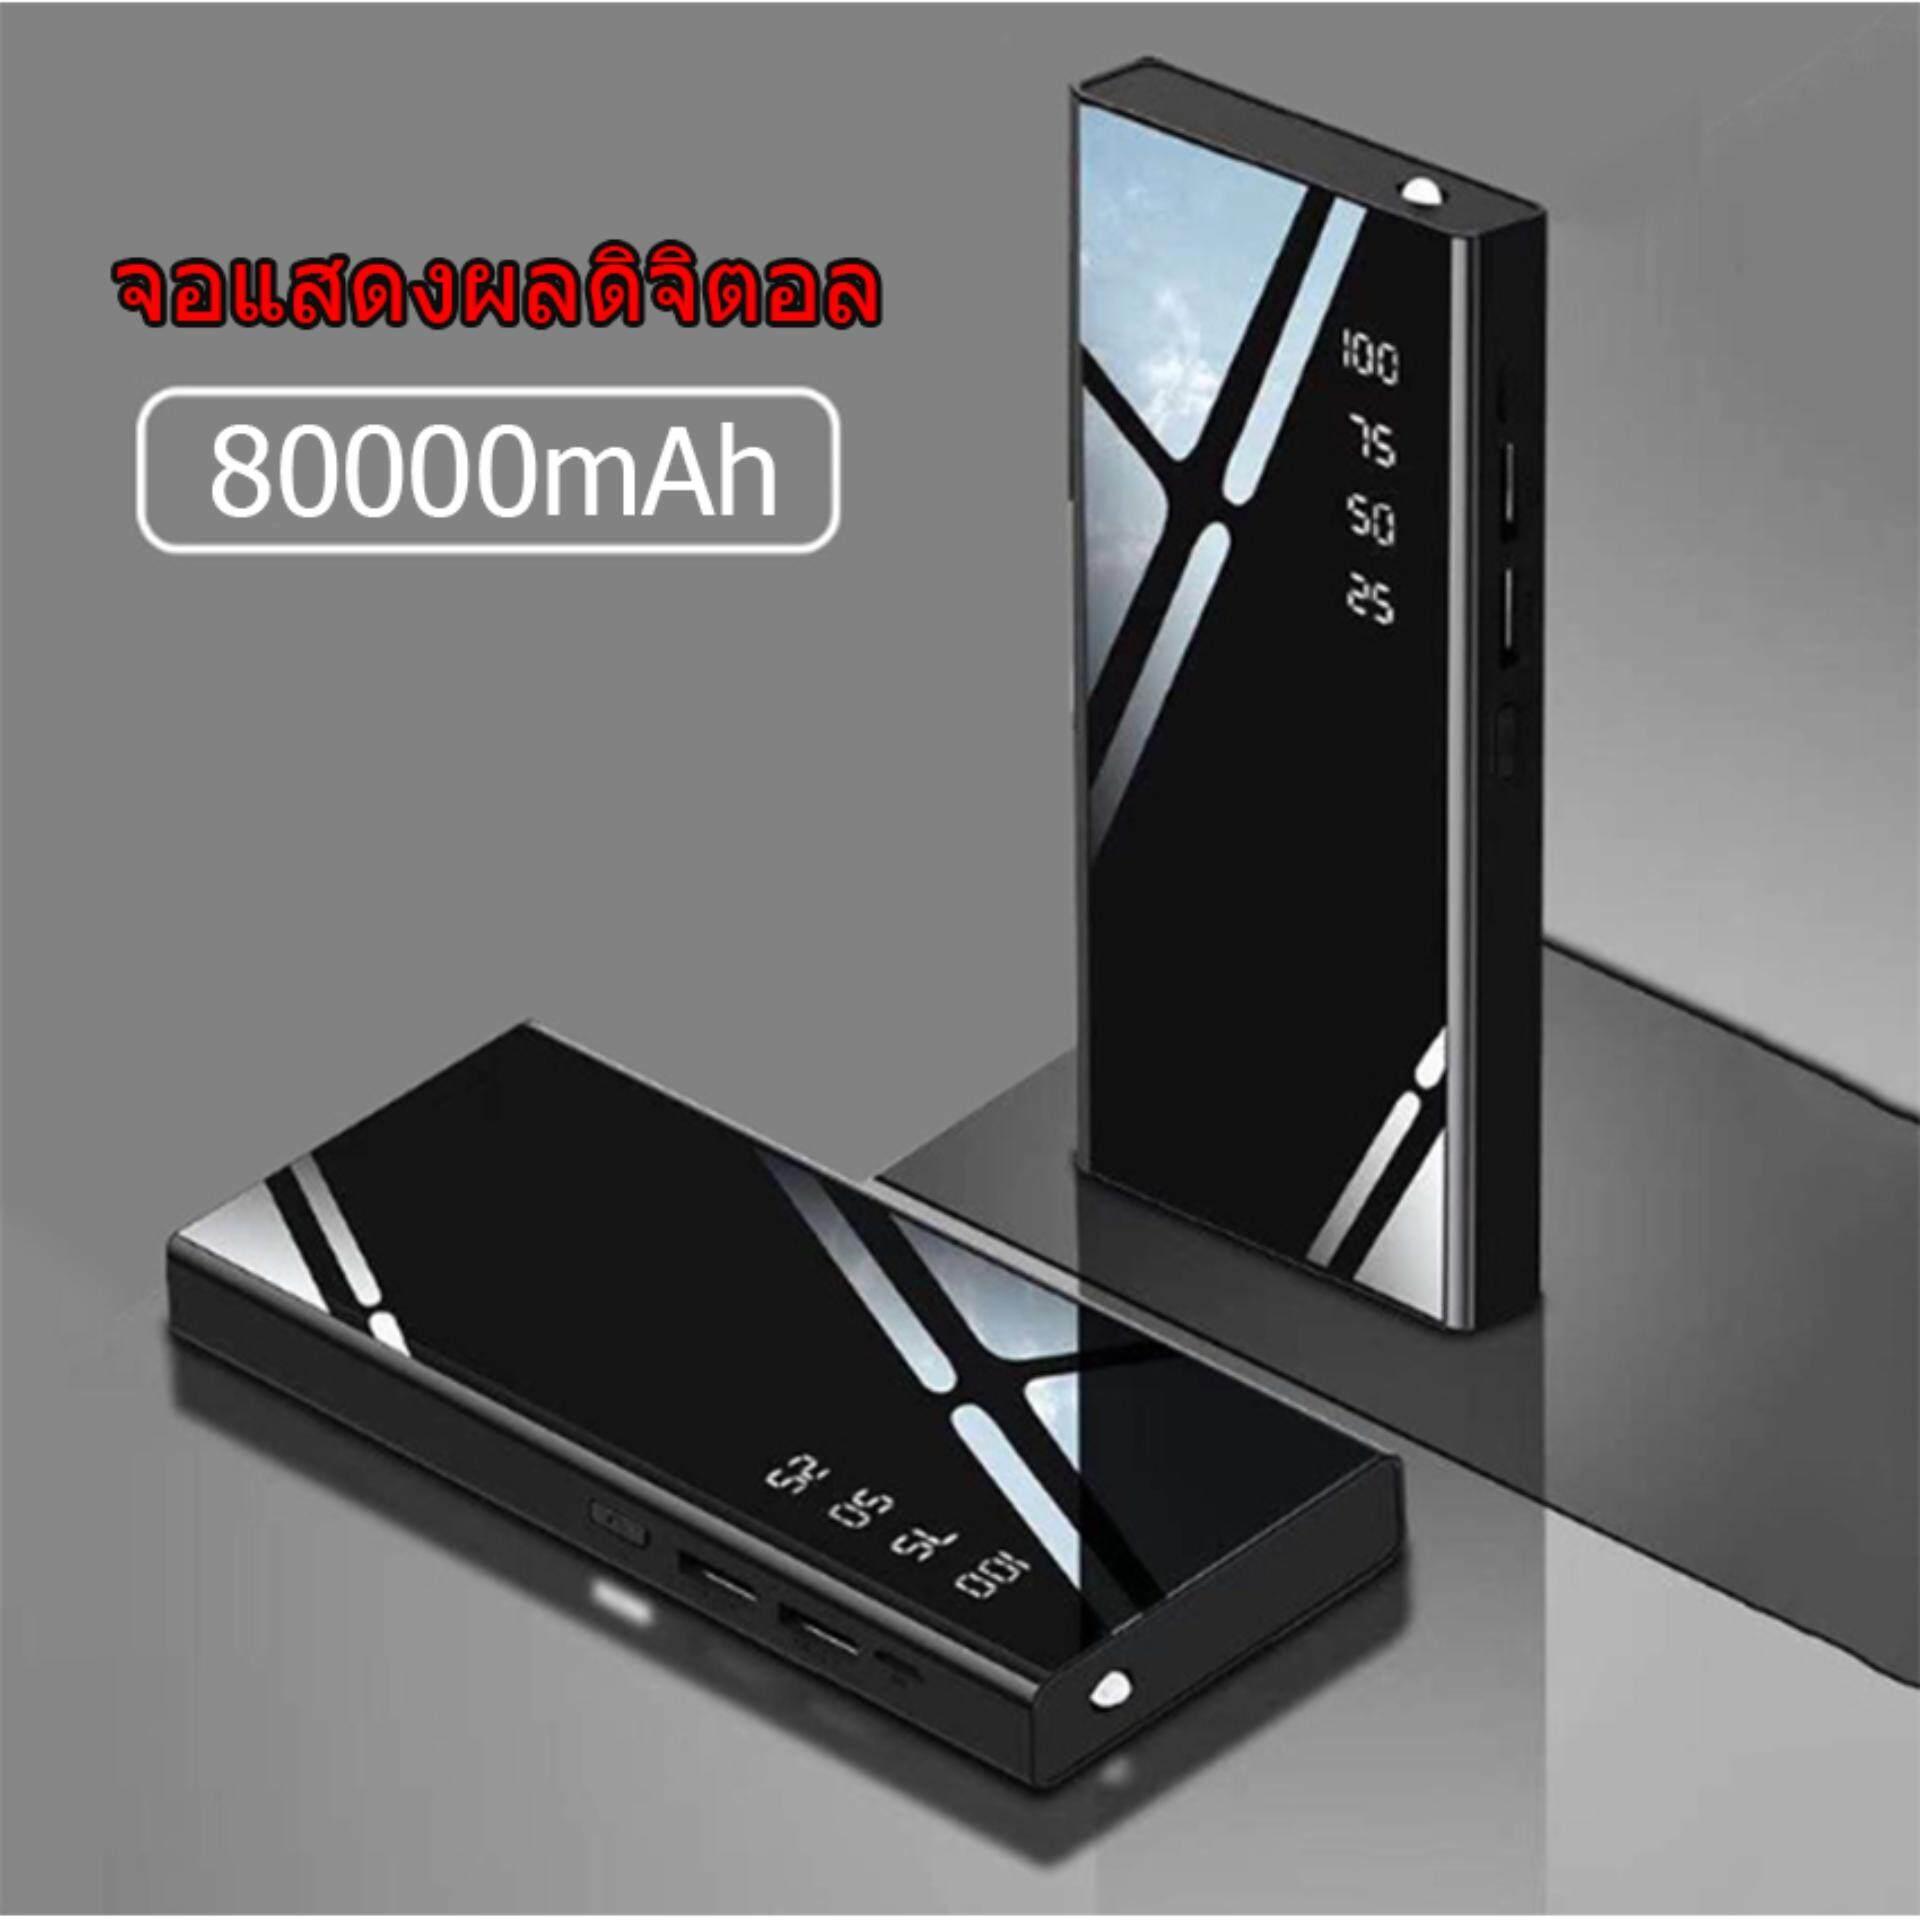 NetworK. 80000 mAh Power Bank ของแท้ 100% 2 Port รุ่น Notebook (ประกัน 5ปี)สามารถใช้กับโทรศัพท์ได้ทุกรุ่น